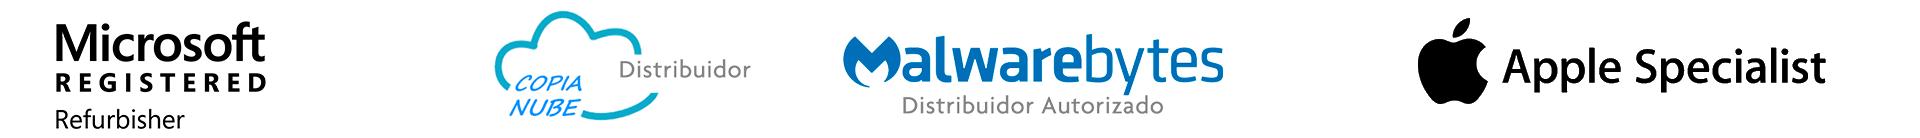 Binaria-informatica-partners